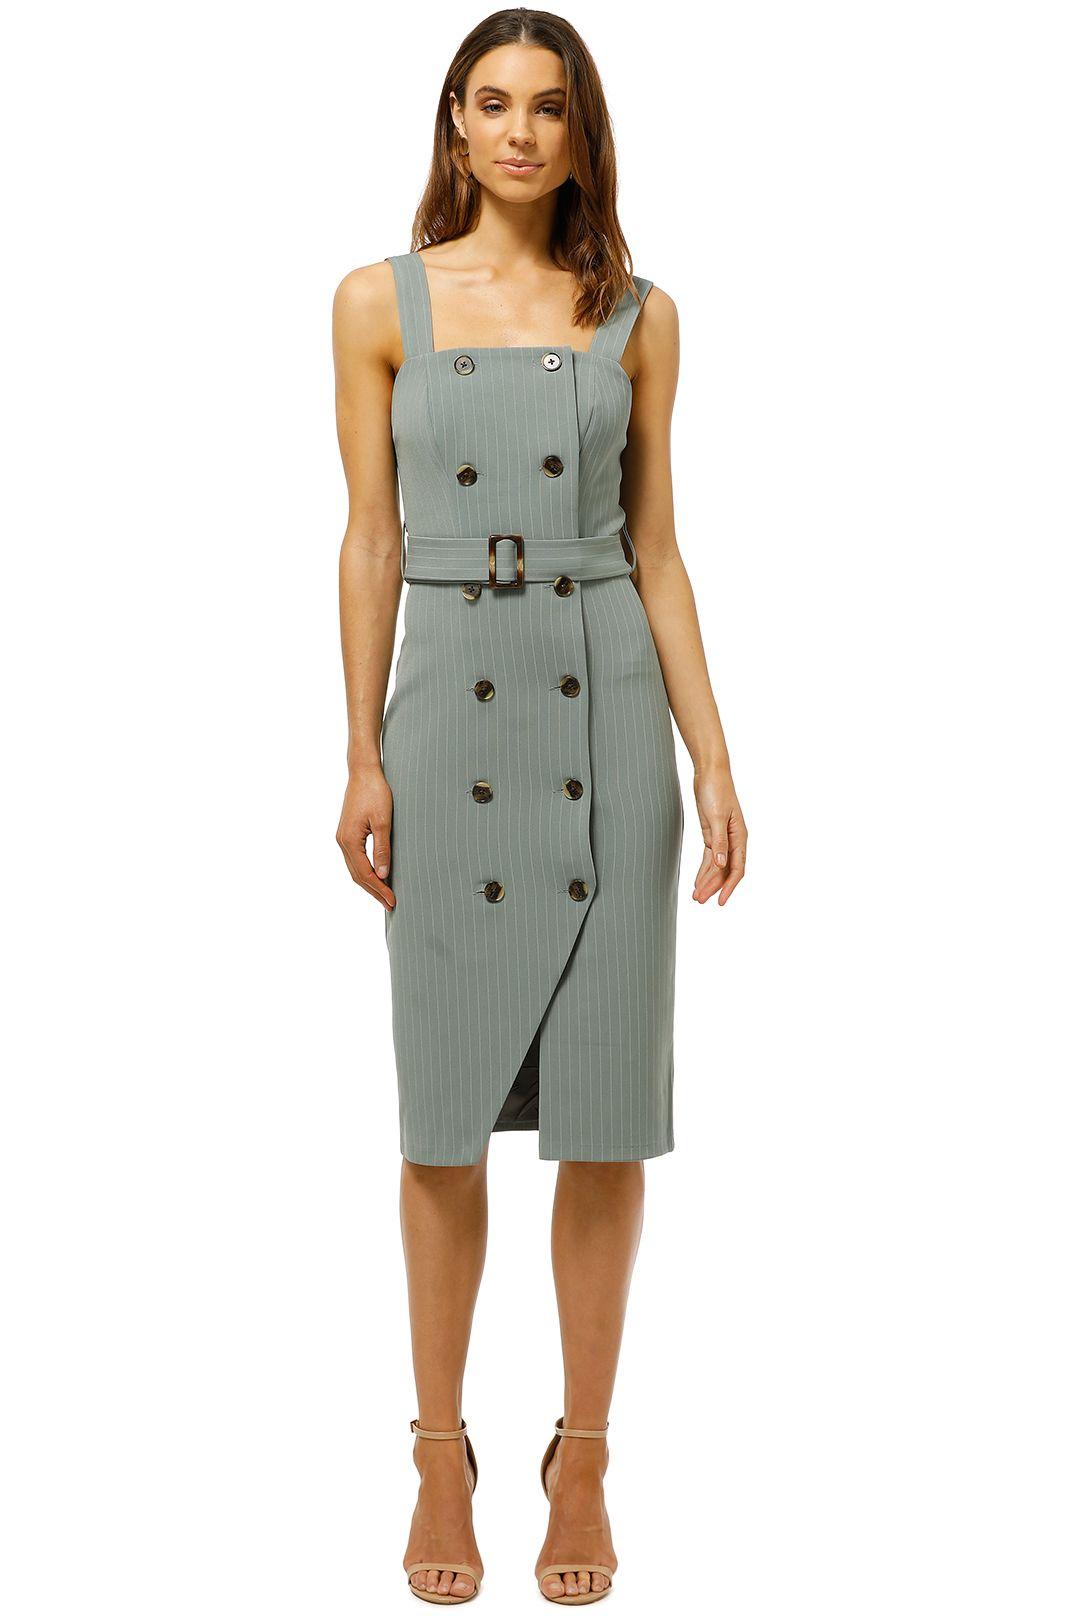 Wish-Laneway-Midi-Dress-Sage-Pinstripe-Front